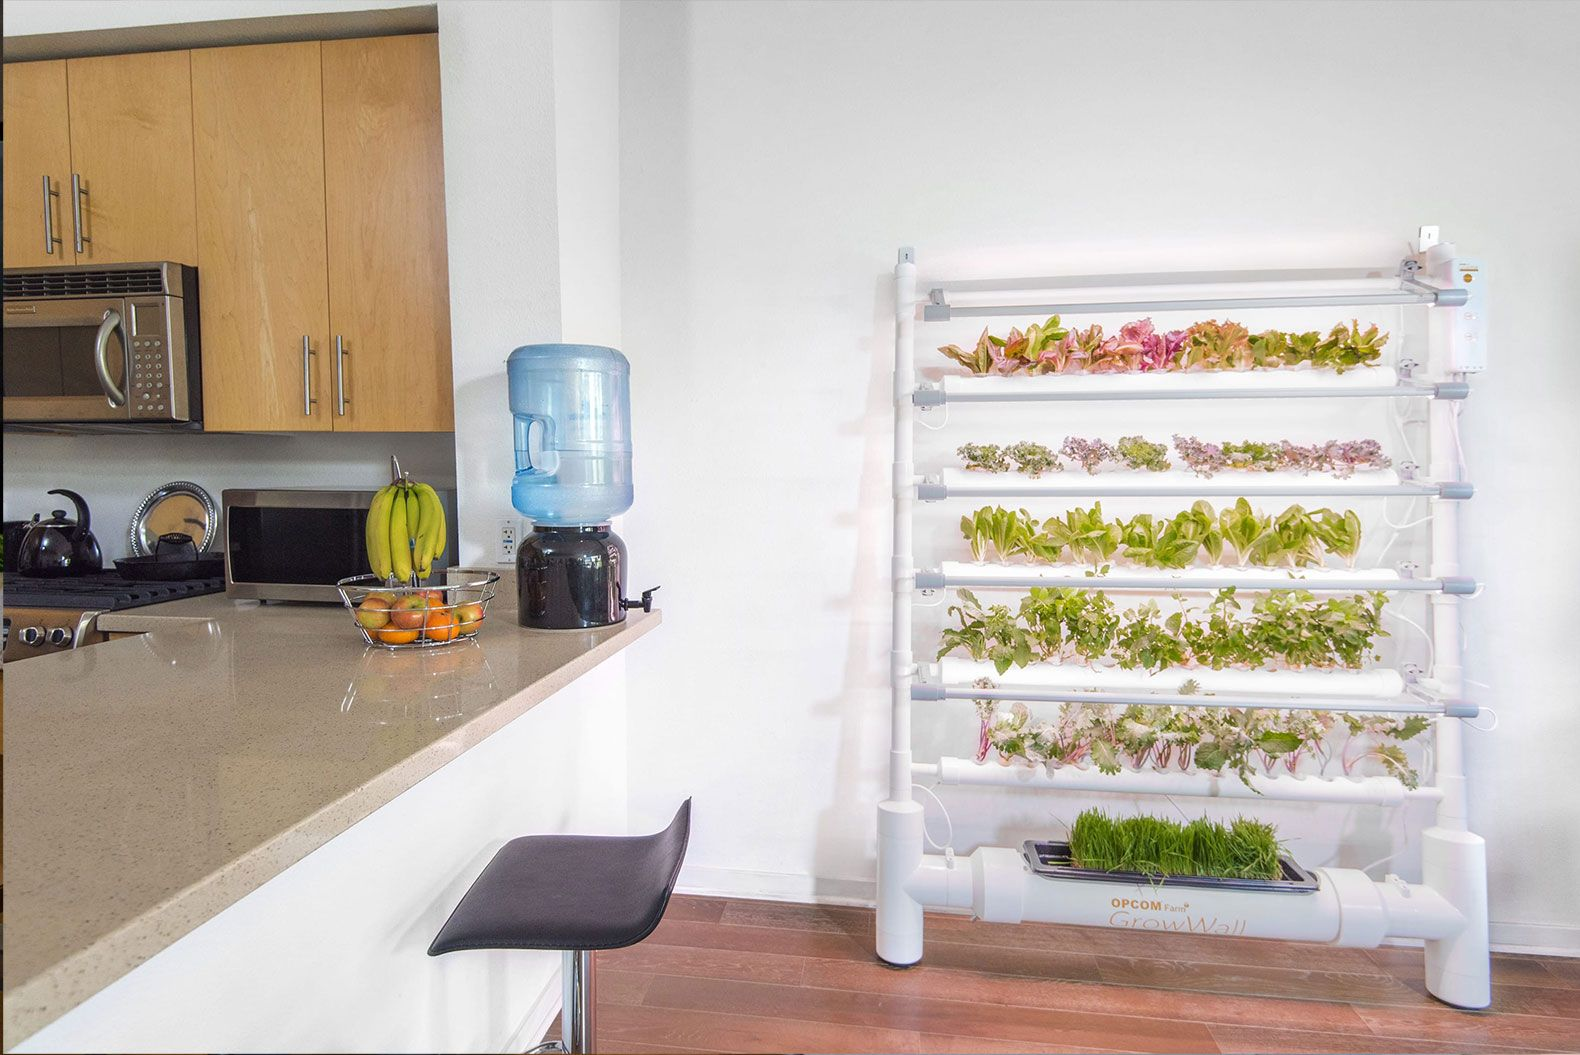 Harvest fresh veggies all yearround with the energy